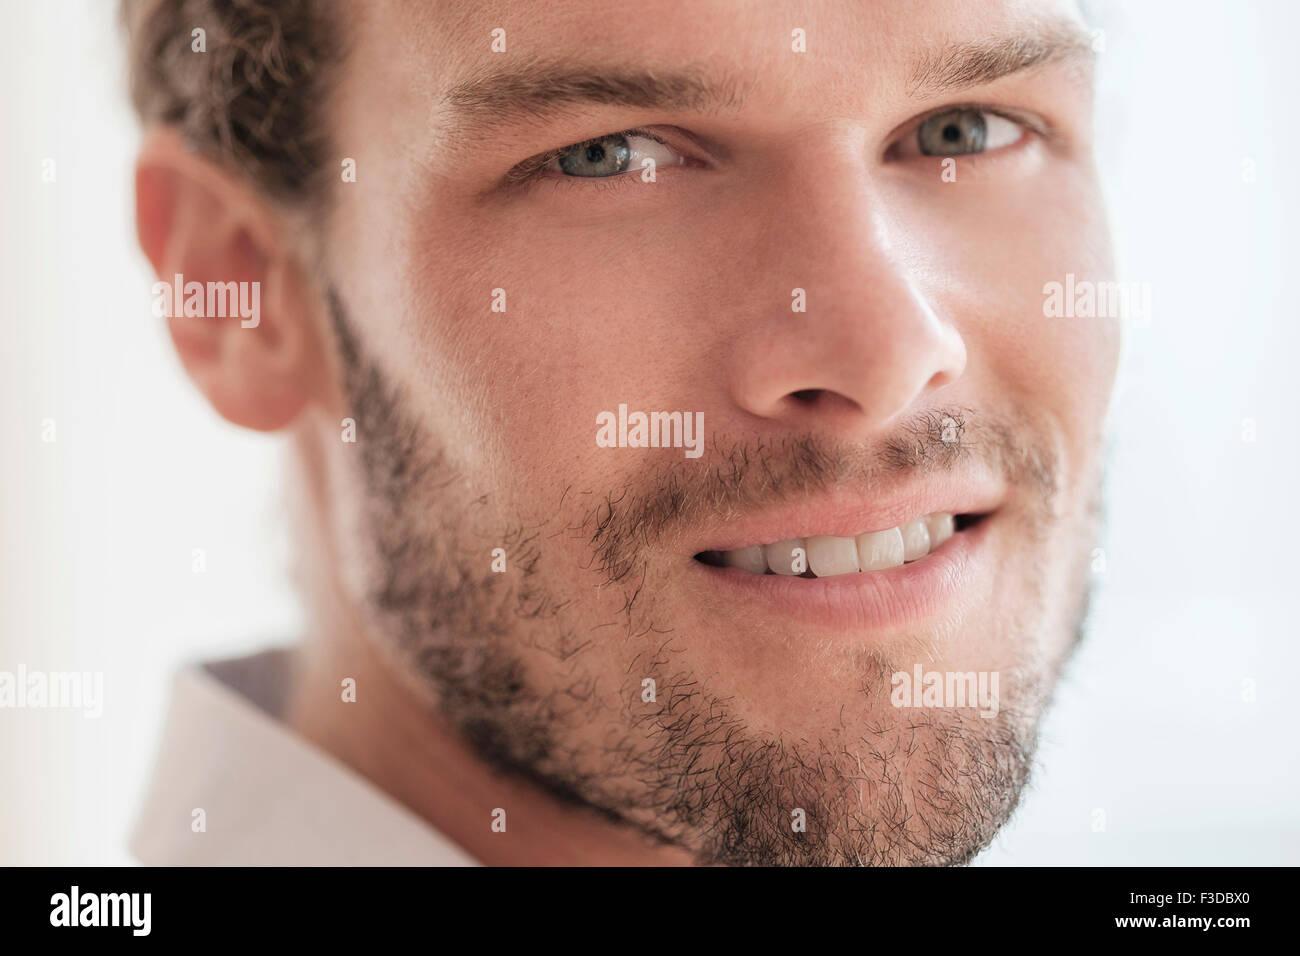 Portrait of mid-adult man Photo Stock